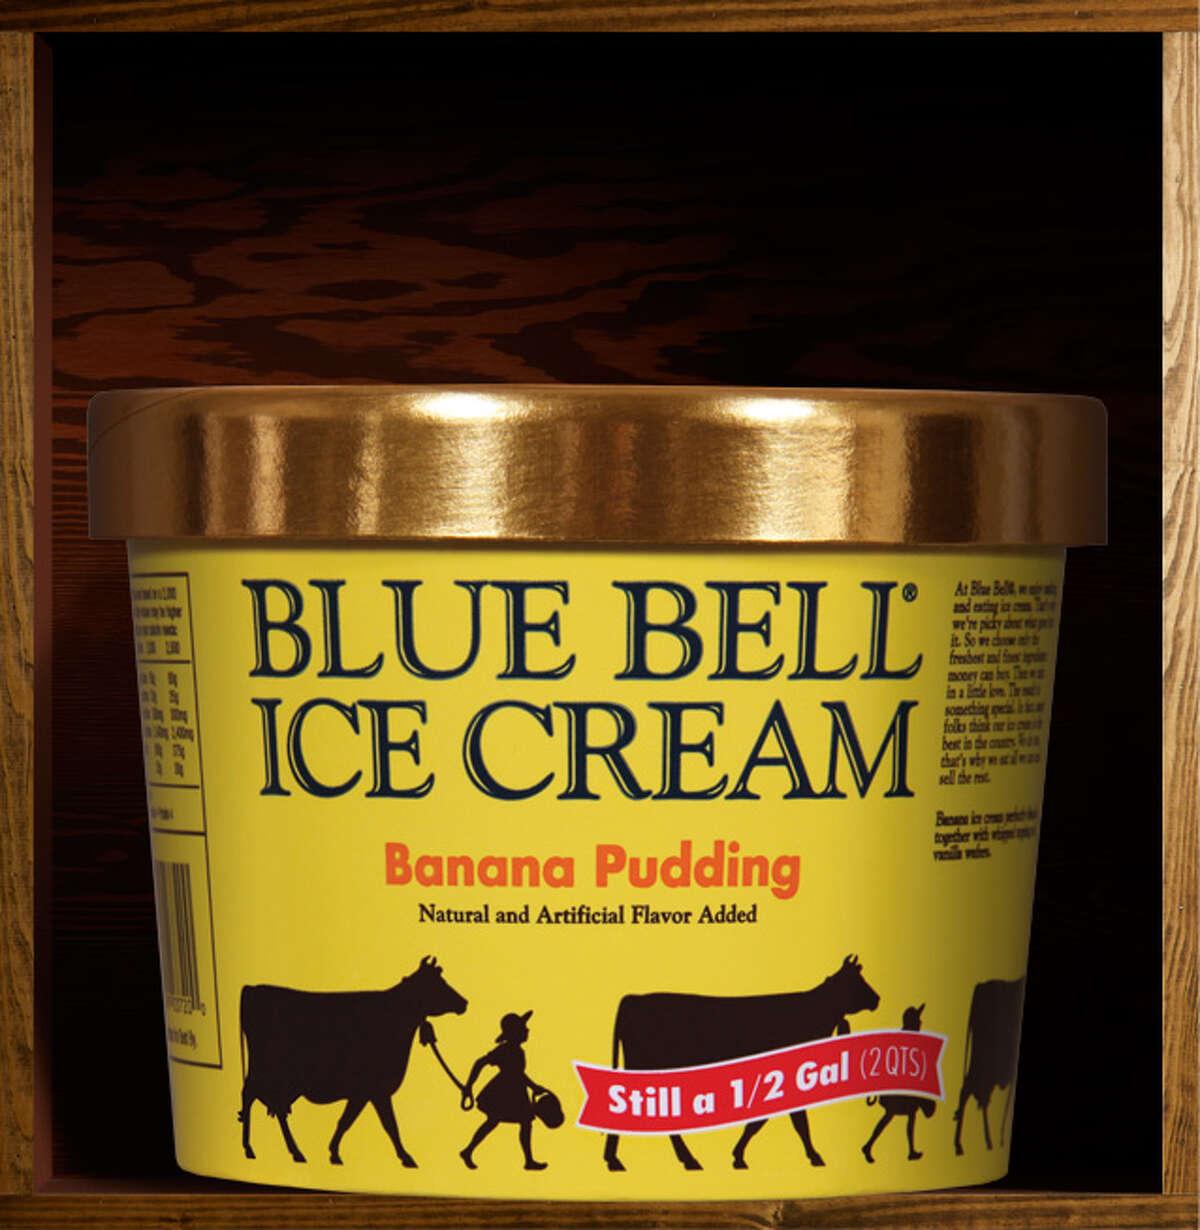 30. Banana Pudding Blue Bell description: